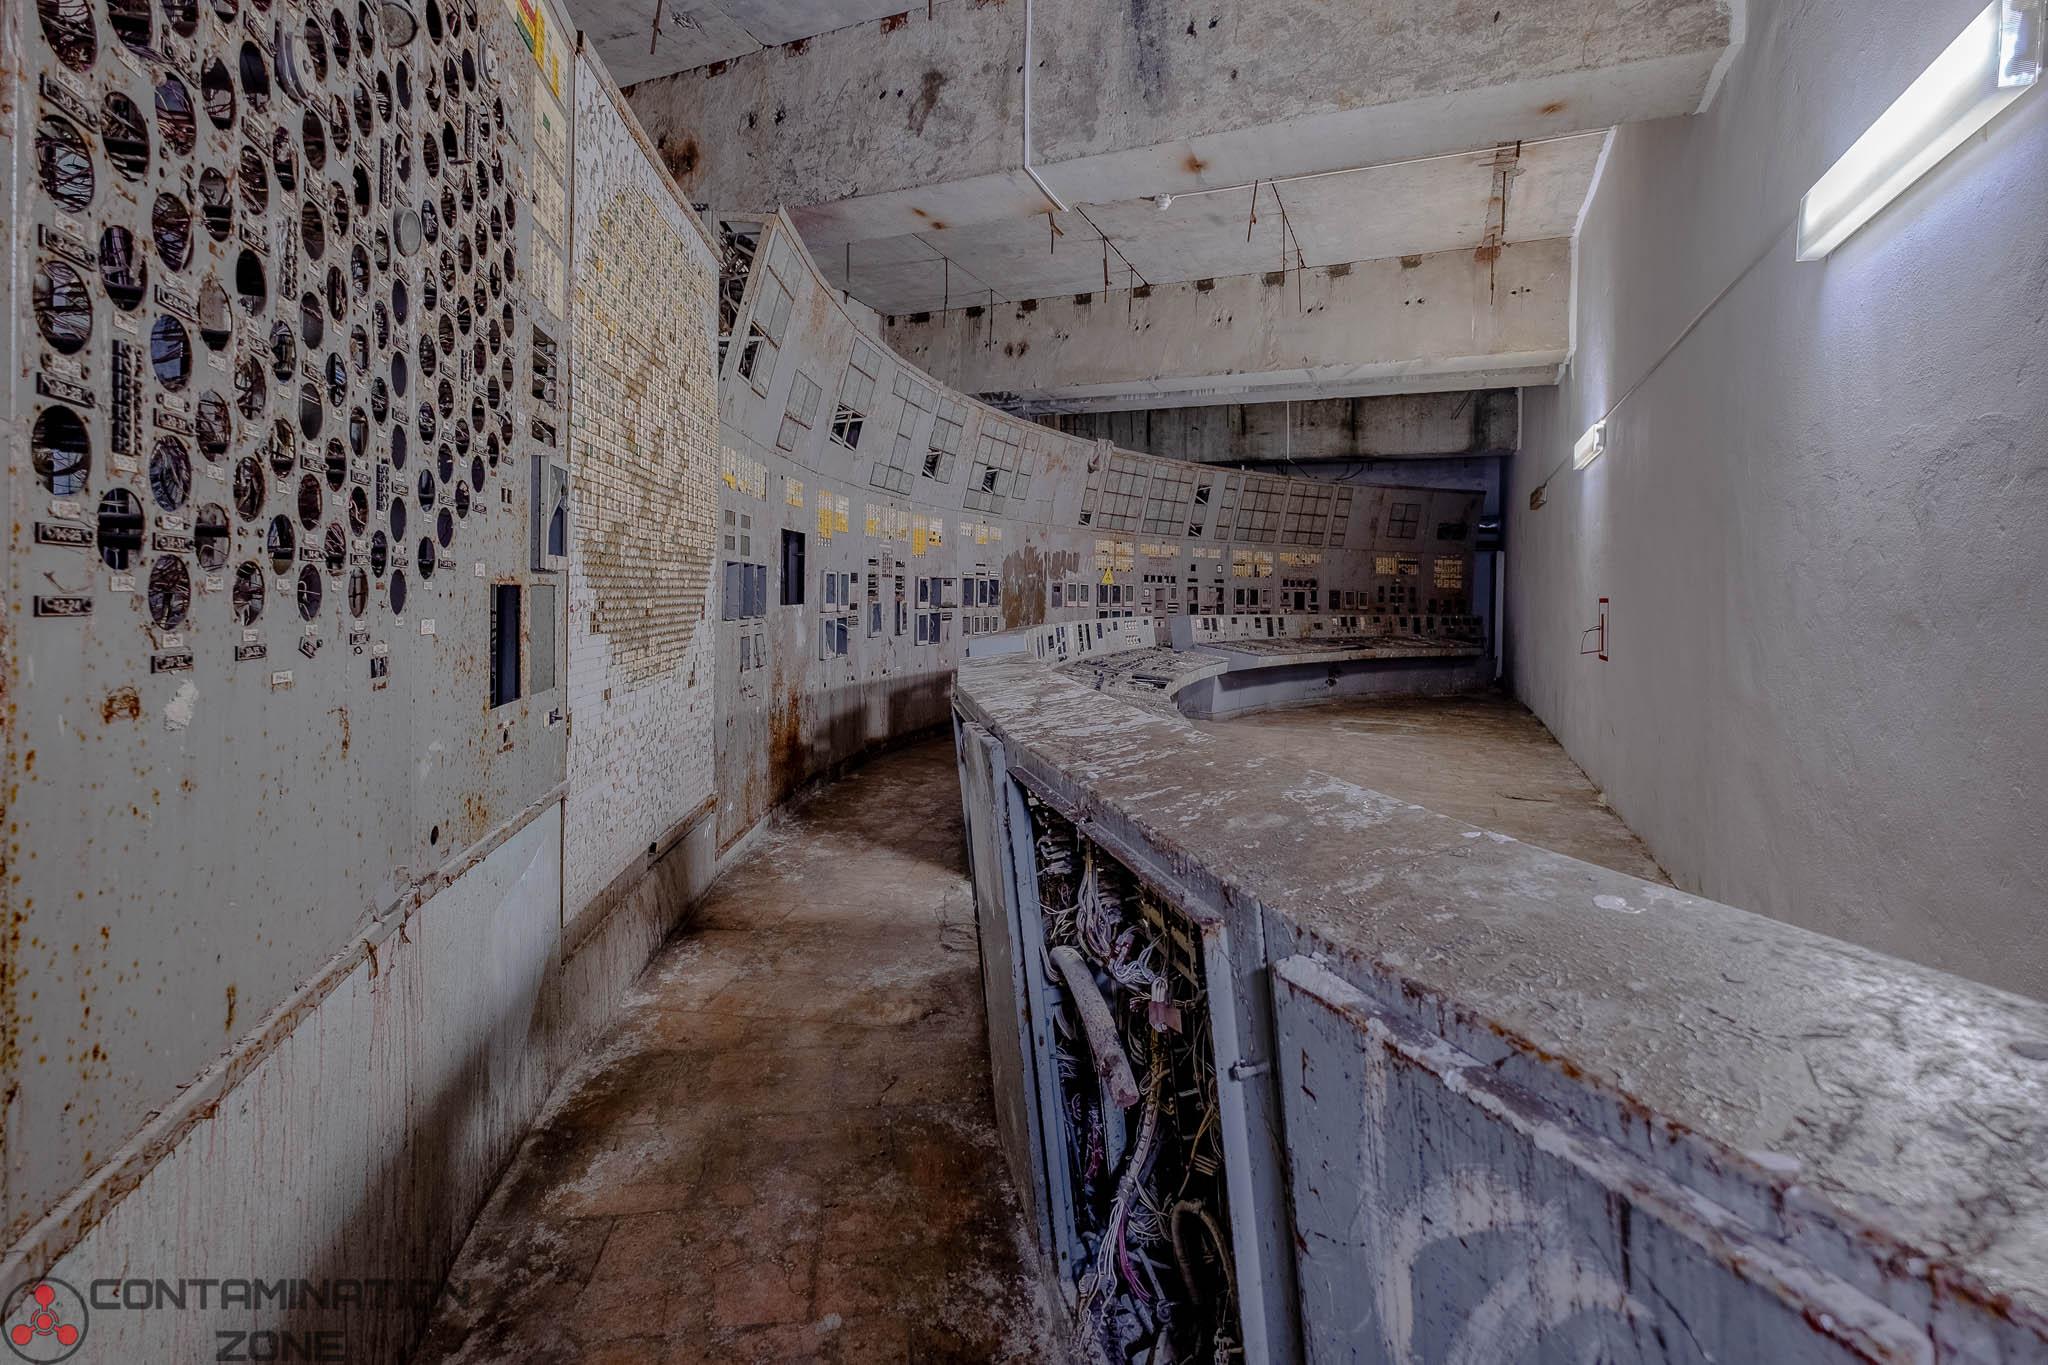 Control room of Chernobyl Reactor 4